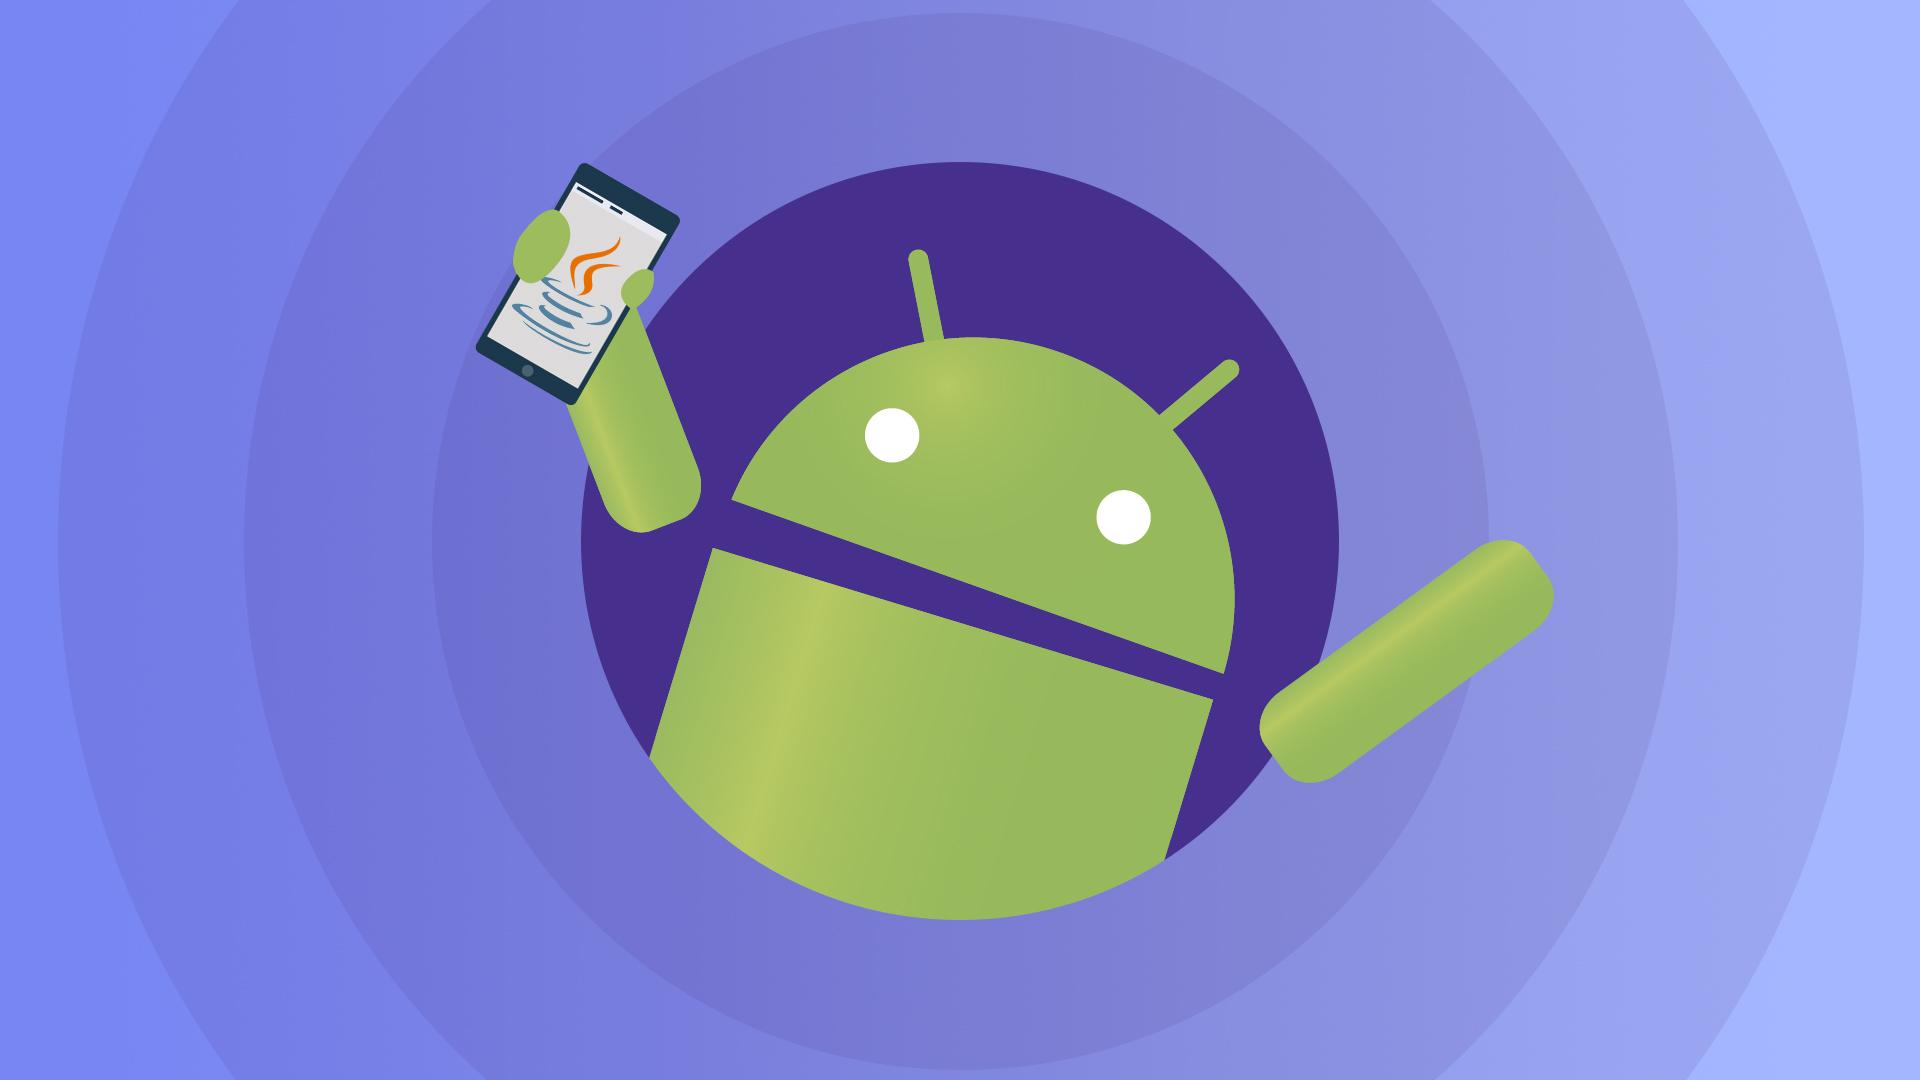 Вебинар Перспективы и потенциал Kotlin в Android-разработке фото